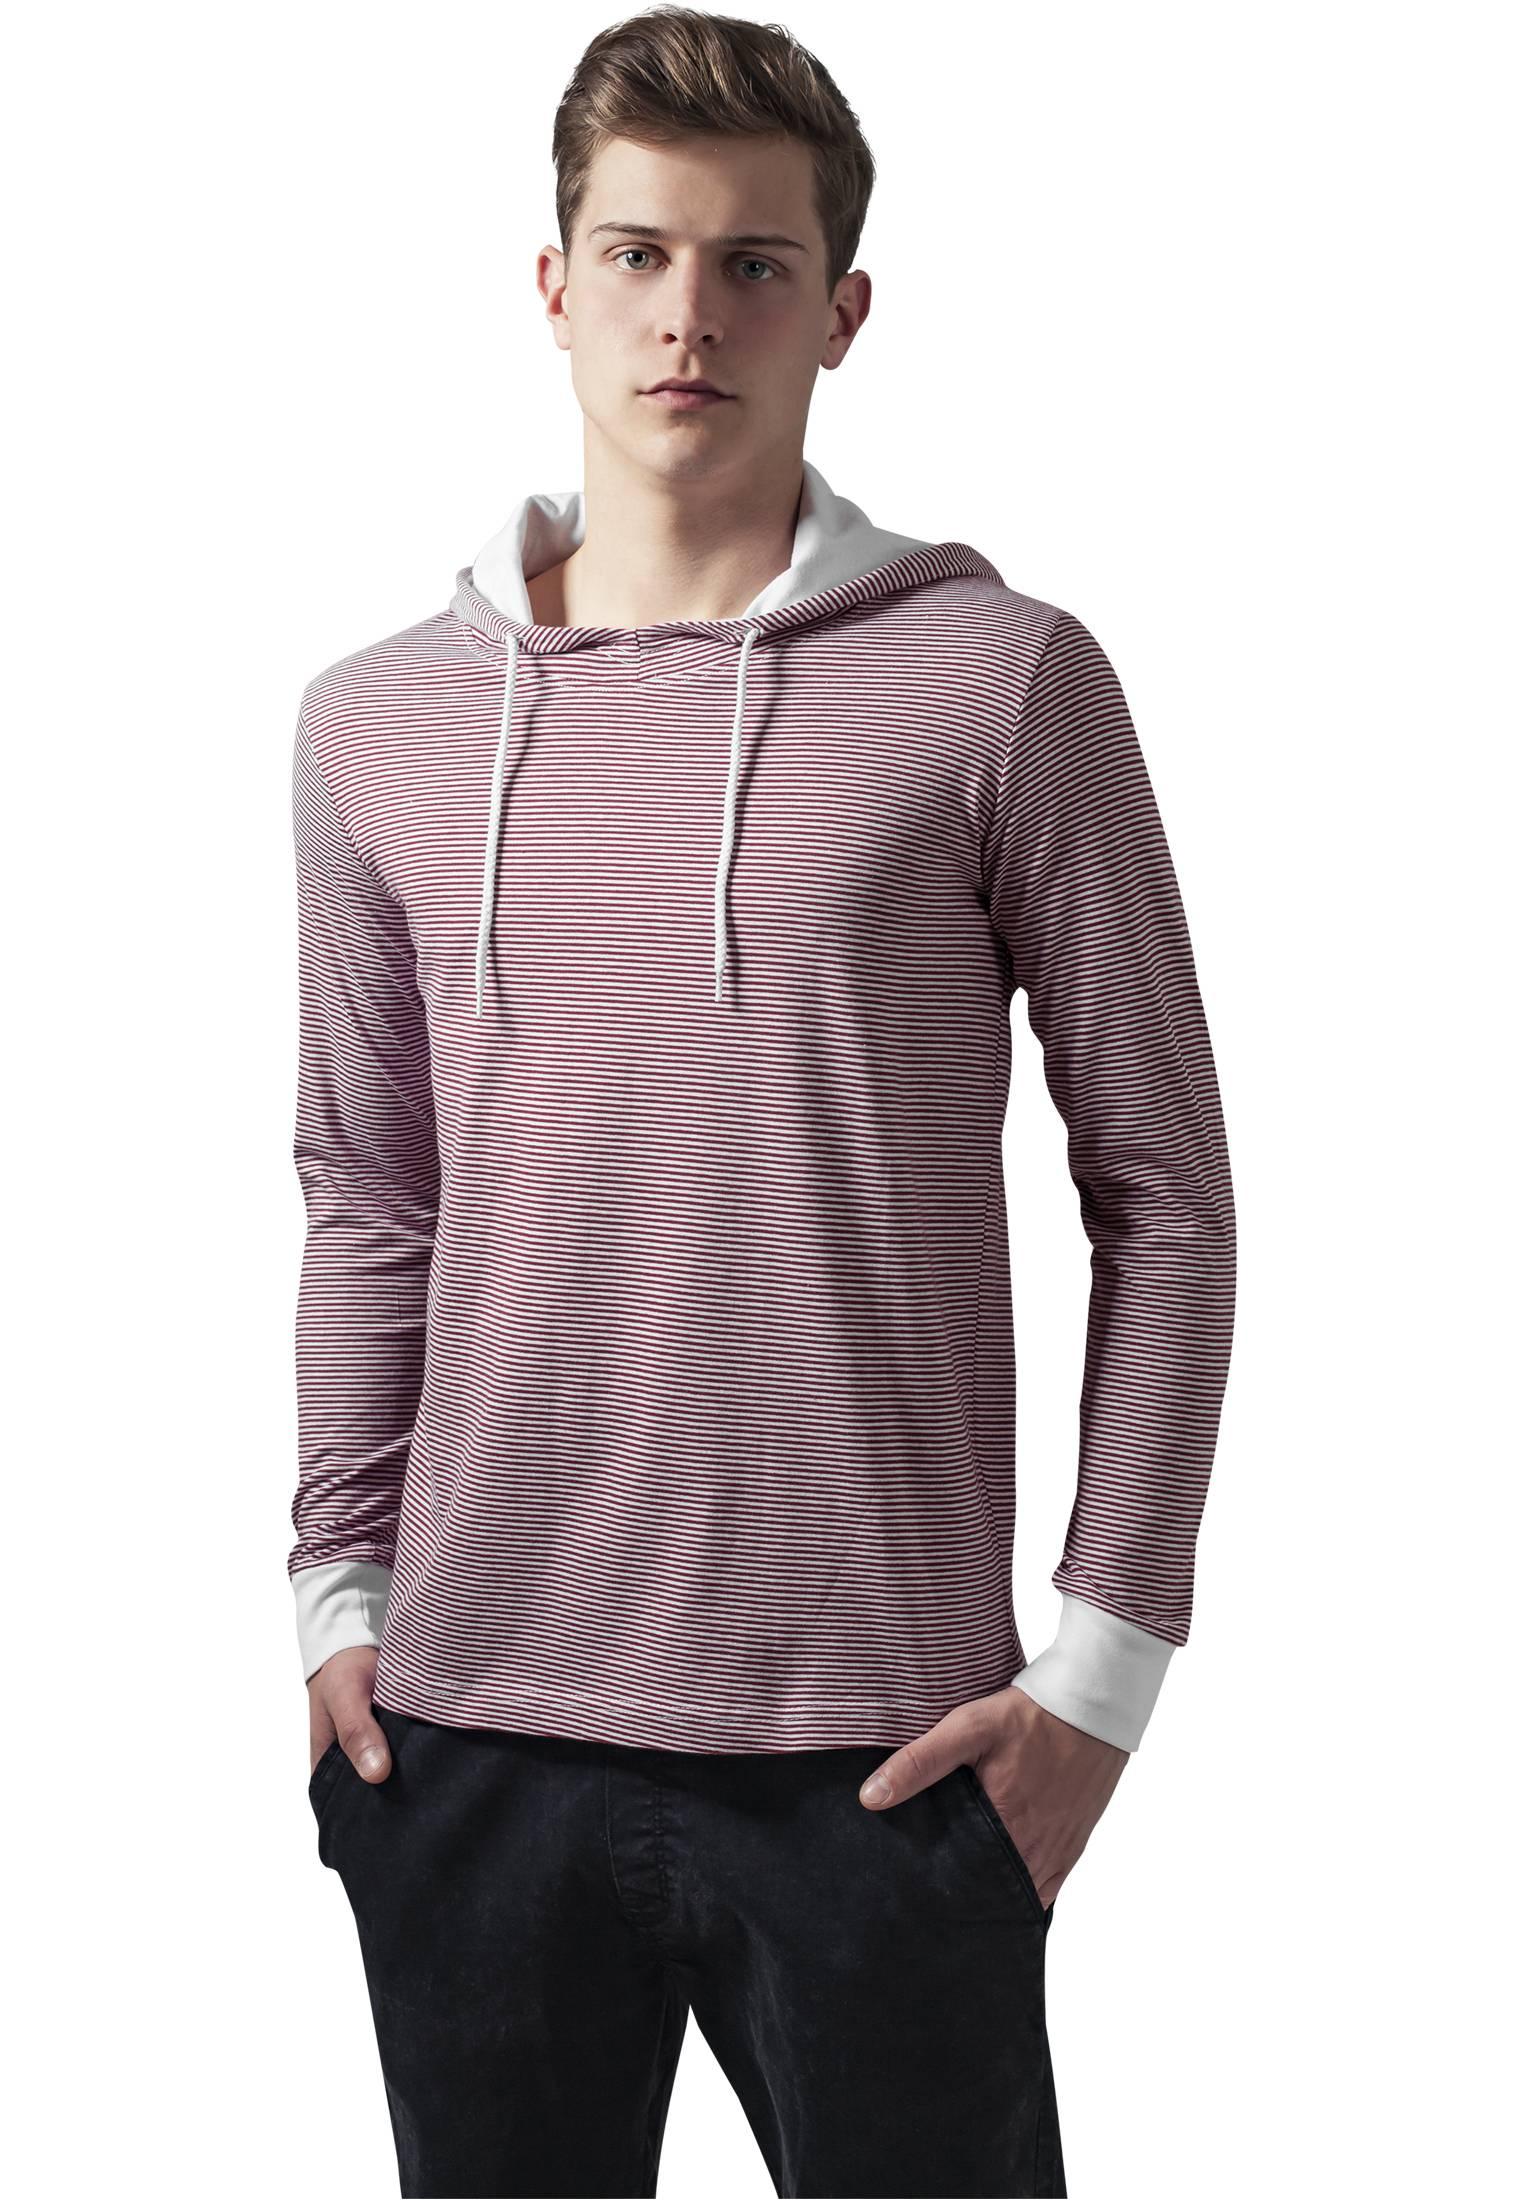 Urban Classics Stripe Jersey Hoody ruby/wht - M